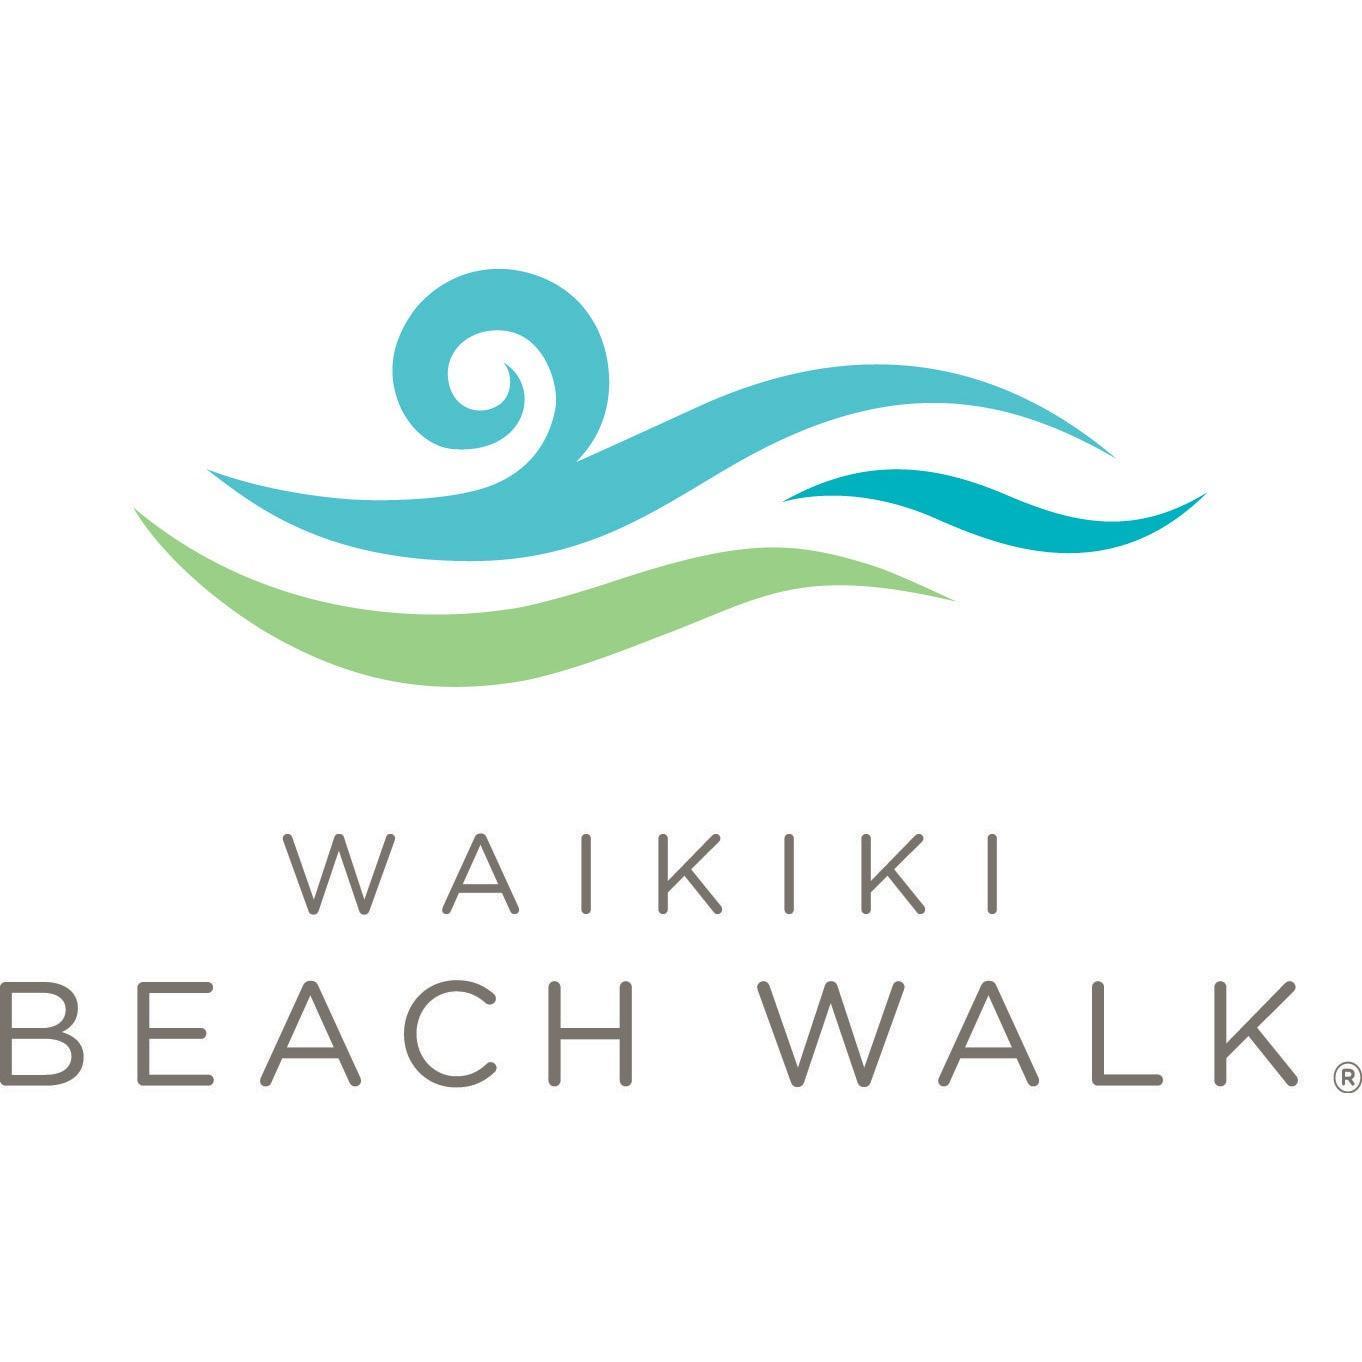 Waikiki Beach Walk Waikikibeachwlk Twitter